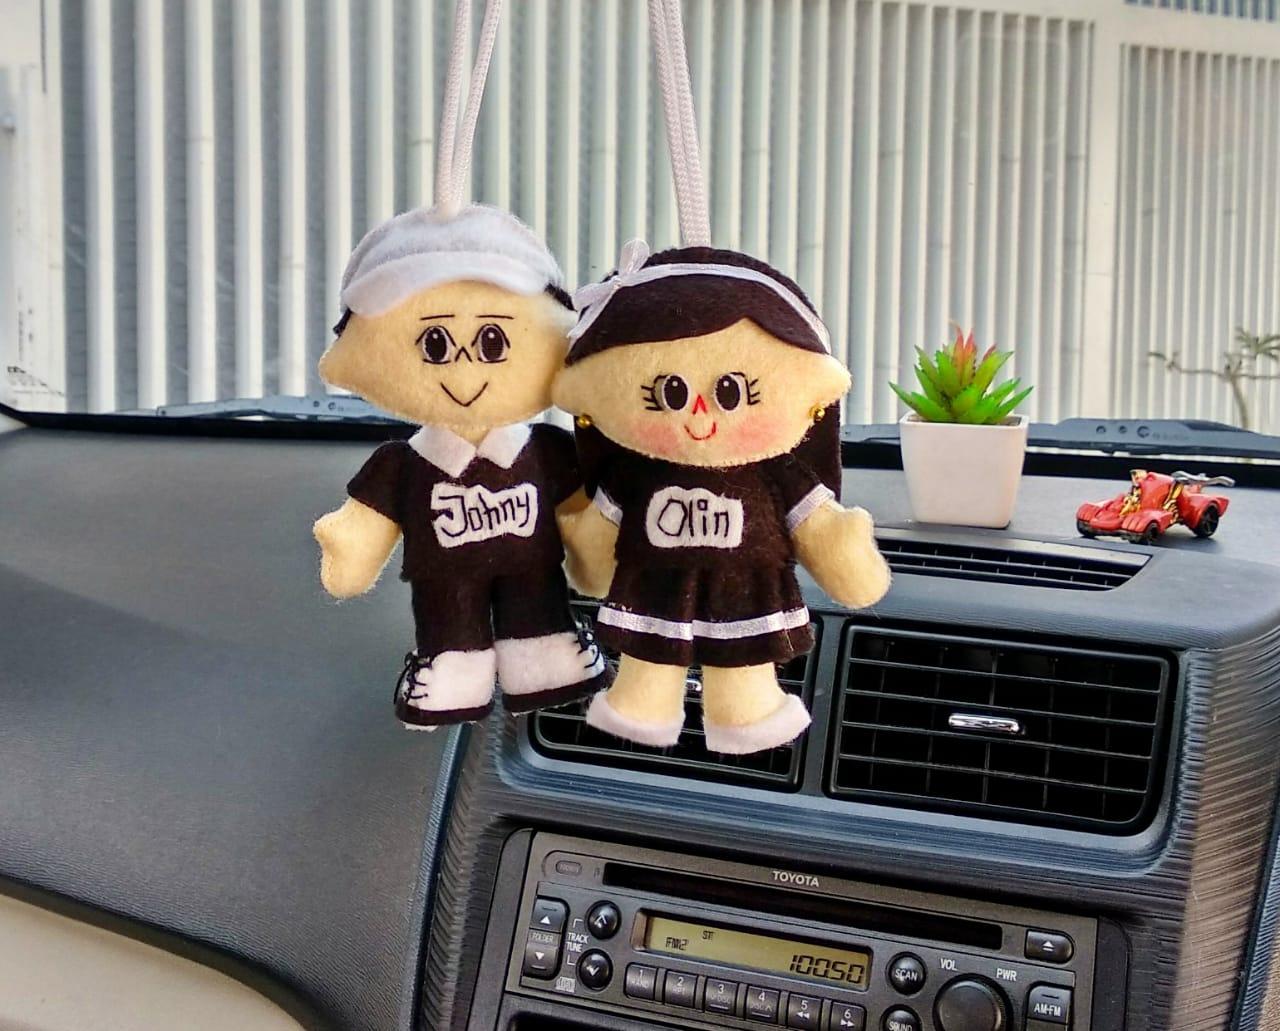 Hiasan-gantungan-spion-mobil-boneka-couple